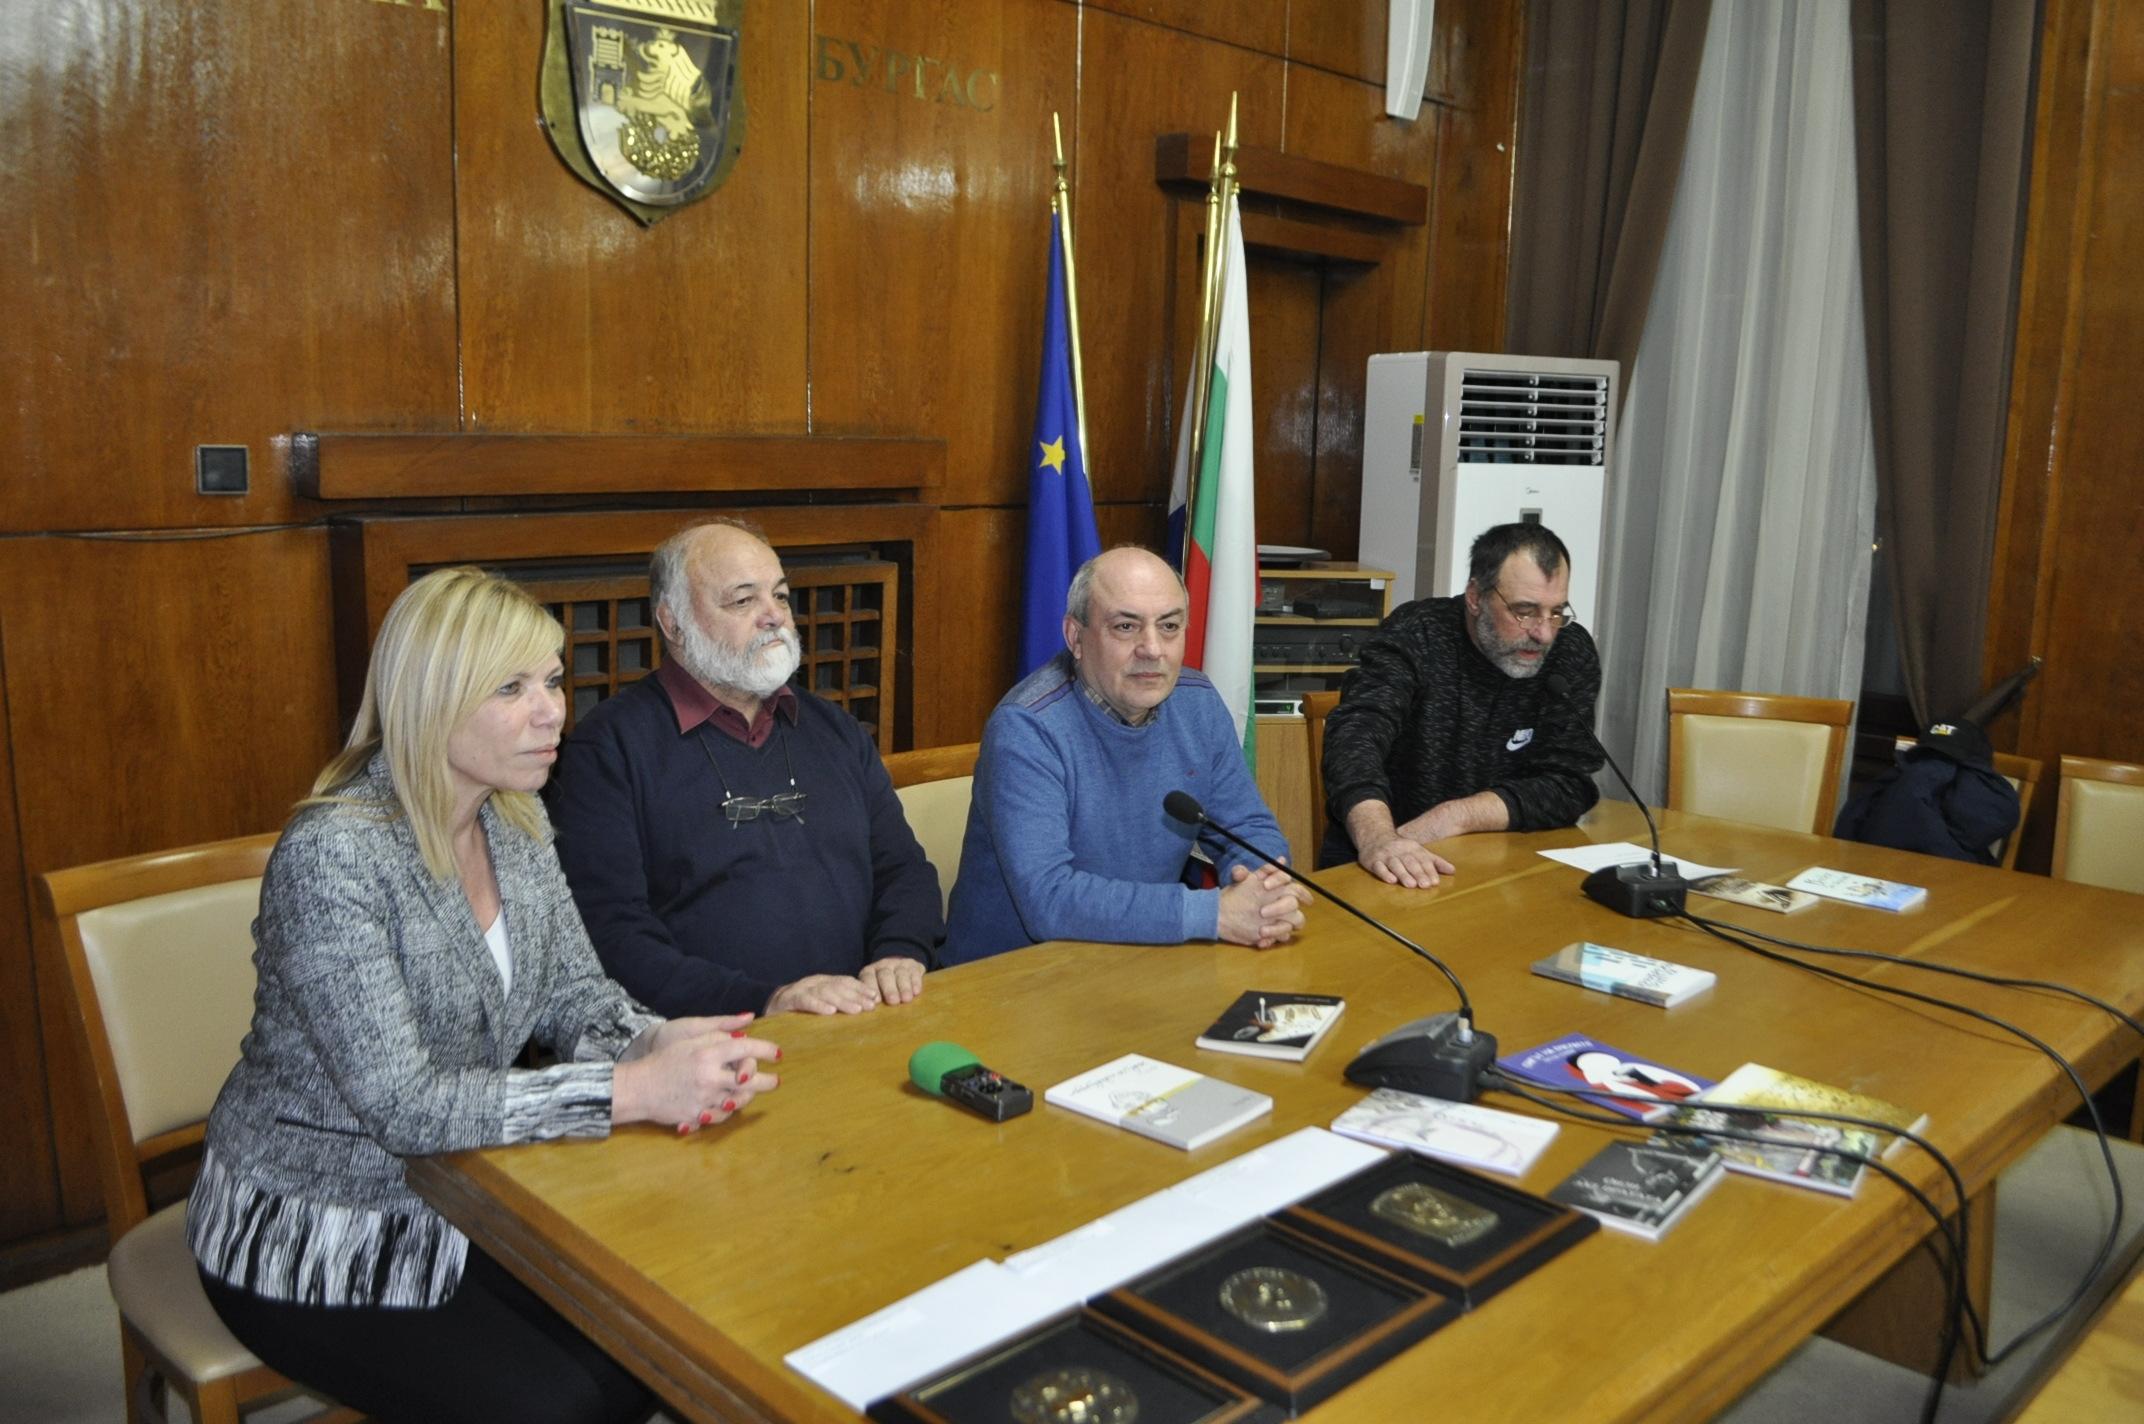 Раздадоха никулденските писателски награди в Бургас